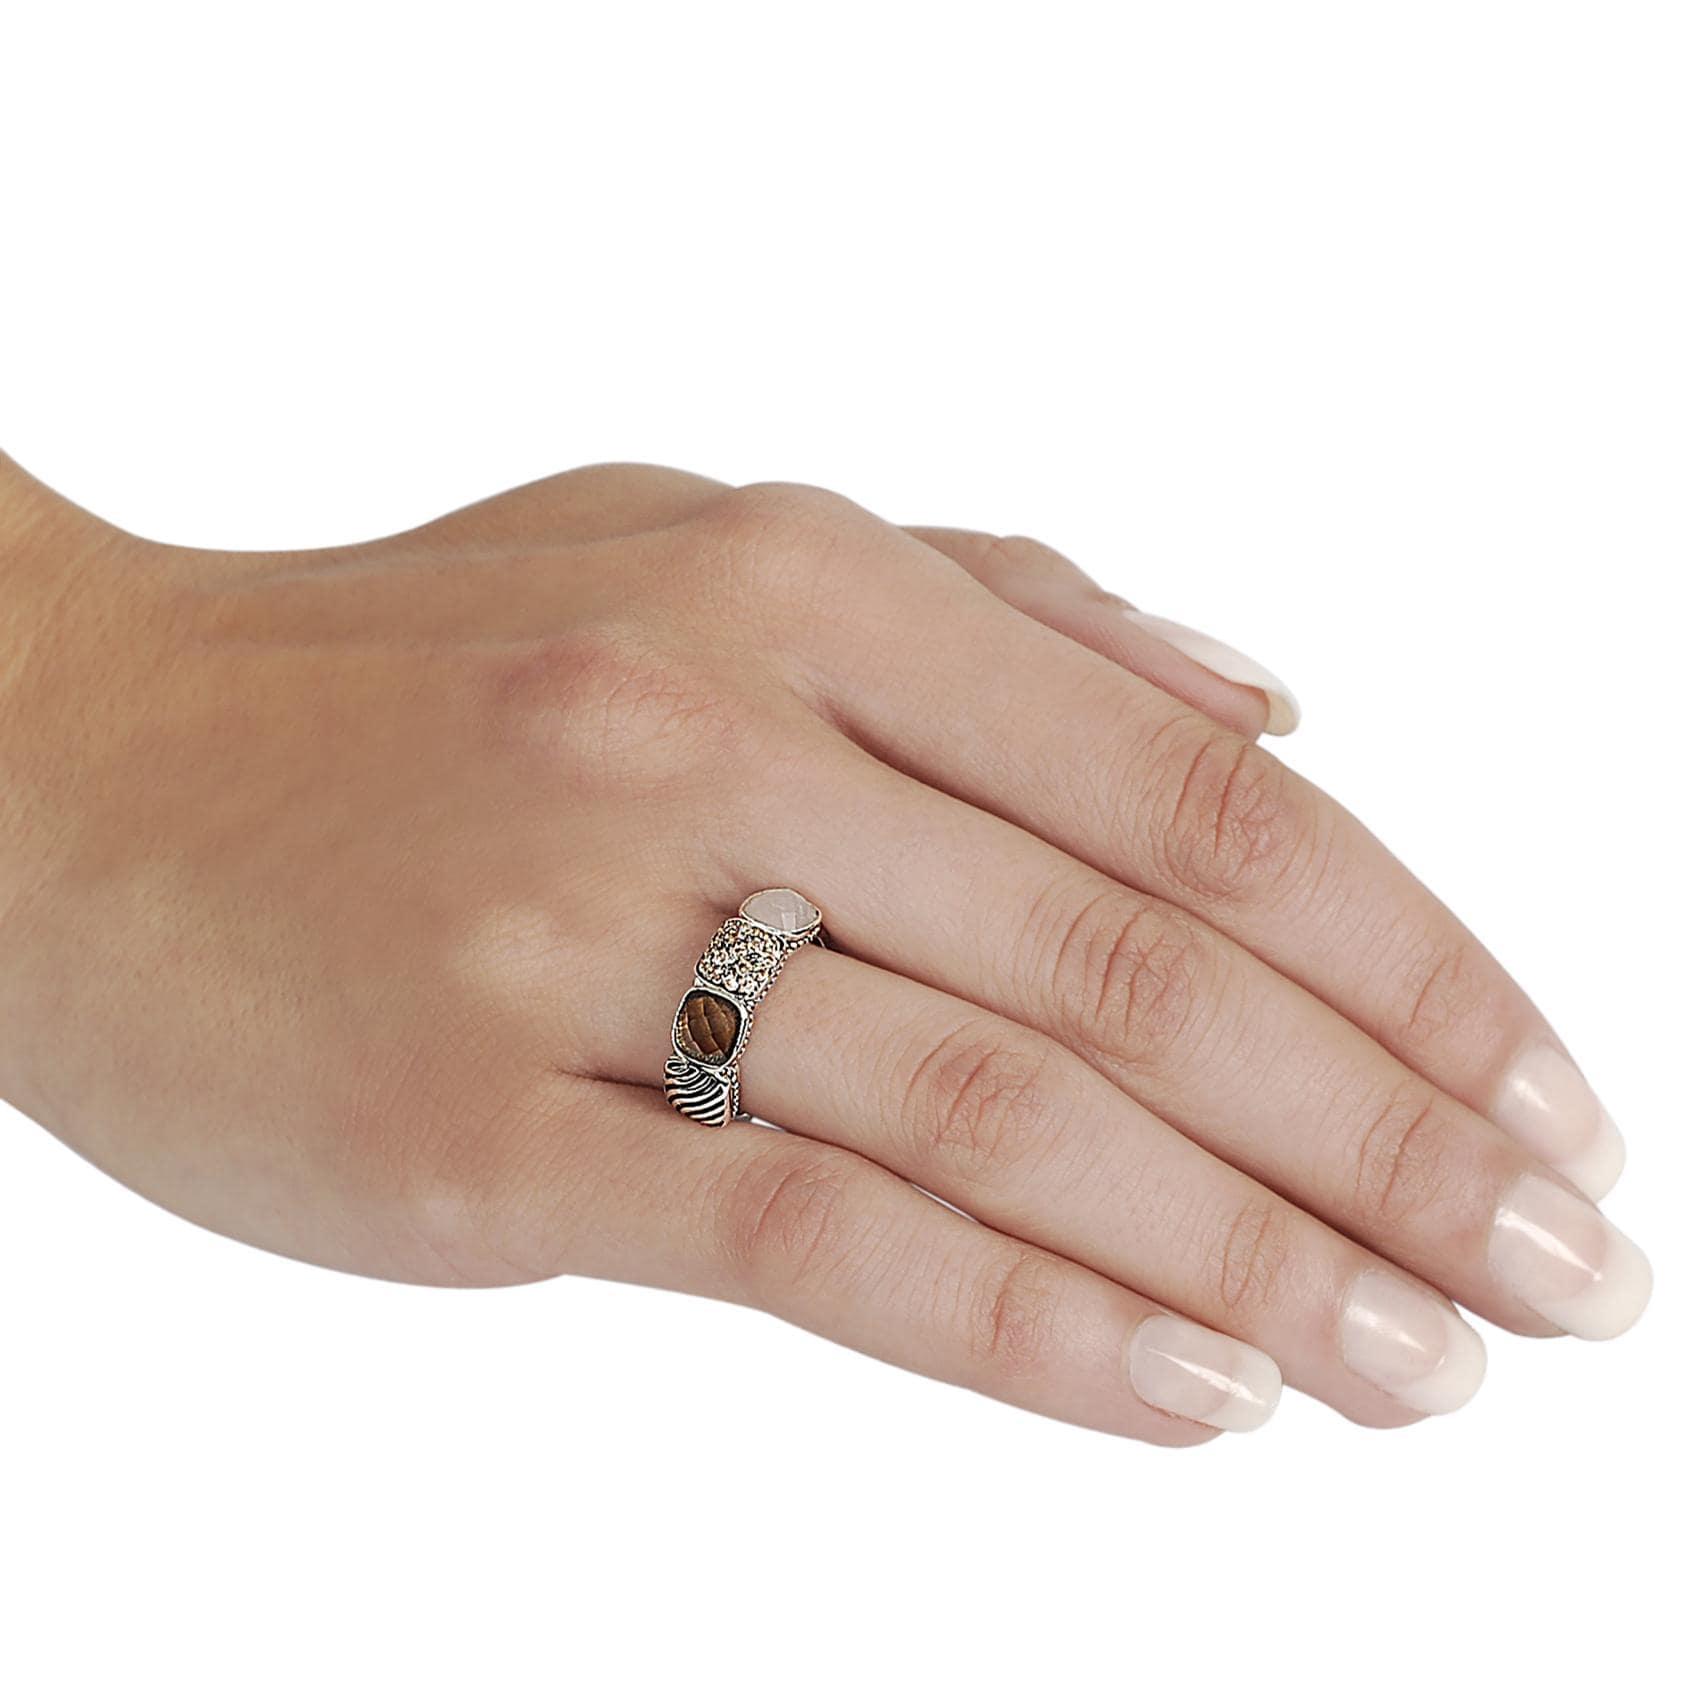 Journee Collection Silvertone Pave-set Cushion-cut CZ Ring - Thumbnail 2